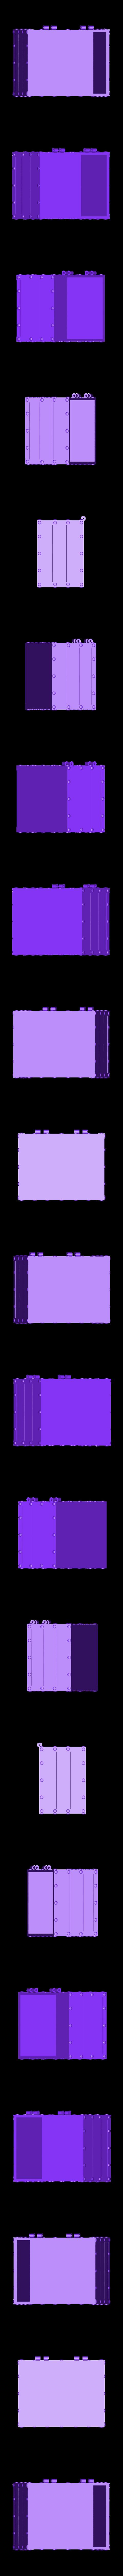 ChestDown.STL Download STL file Treasure chest (Zelda: Ocarina of time) • 3D printable object, Shigeryu